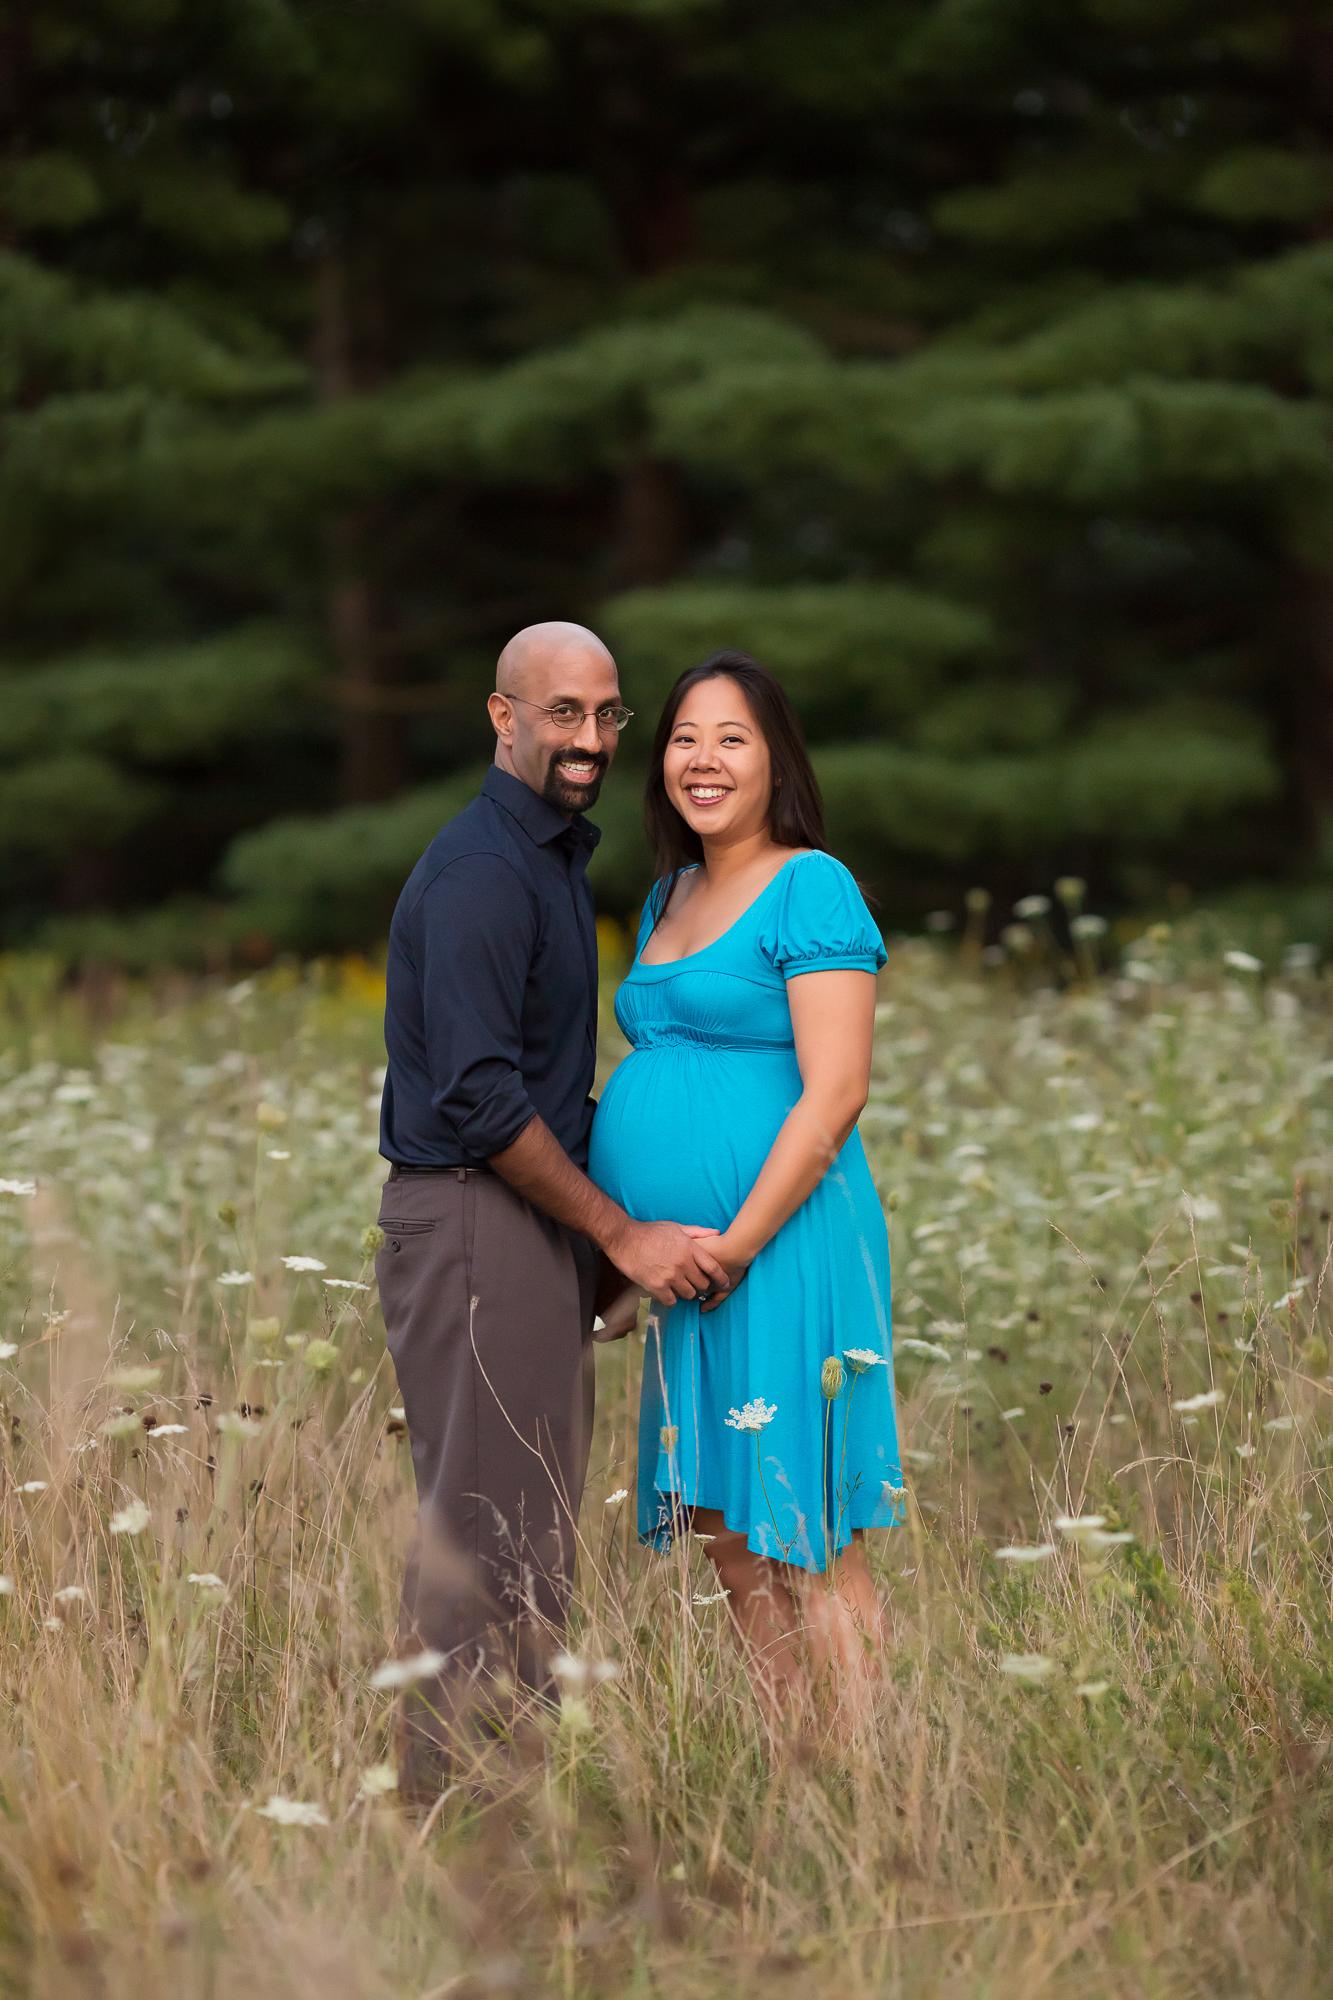 Ann Arbor Maternity Photographer | A Sunset Garden Session